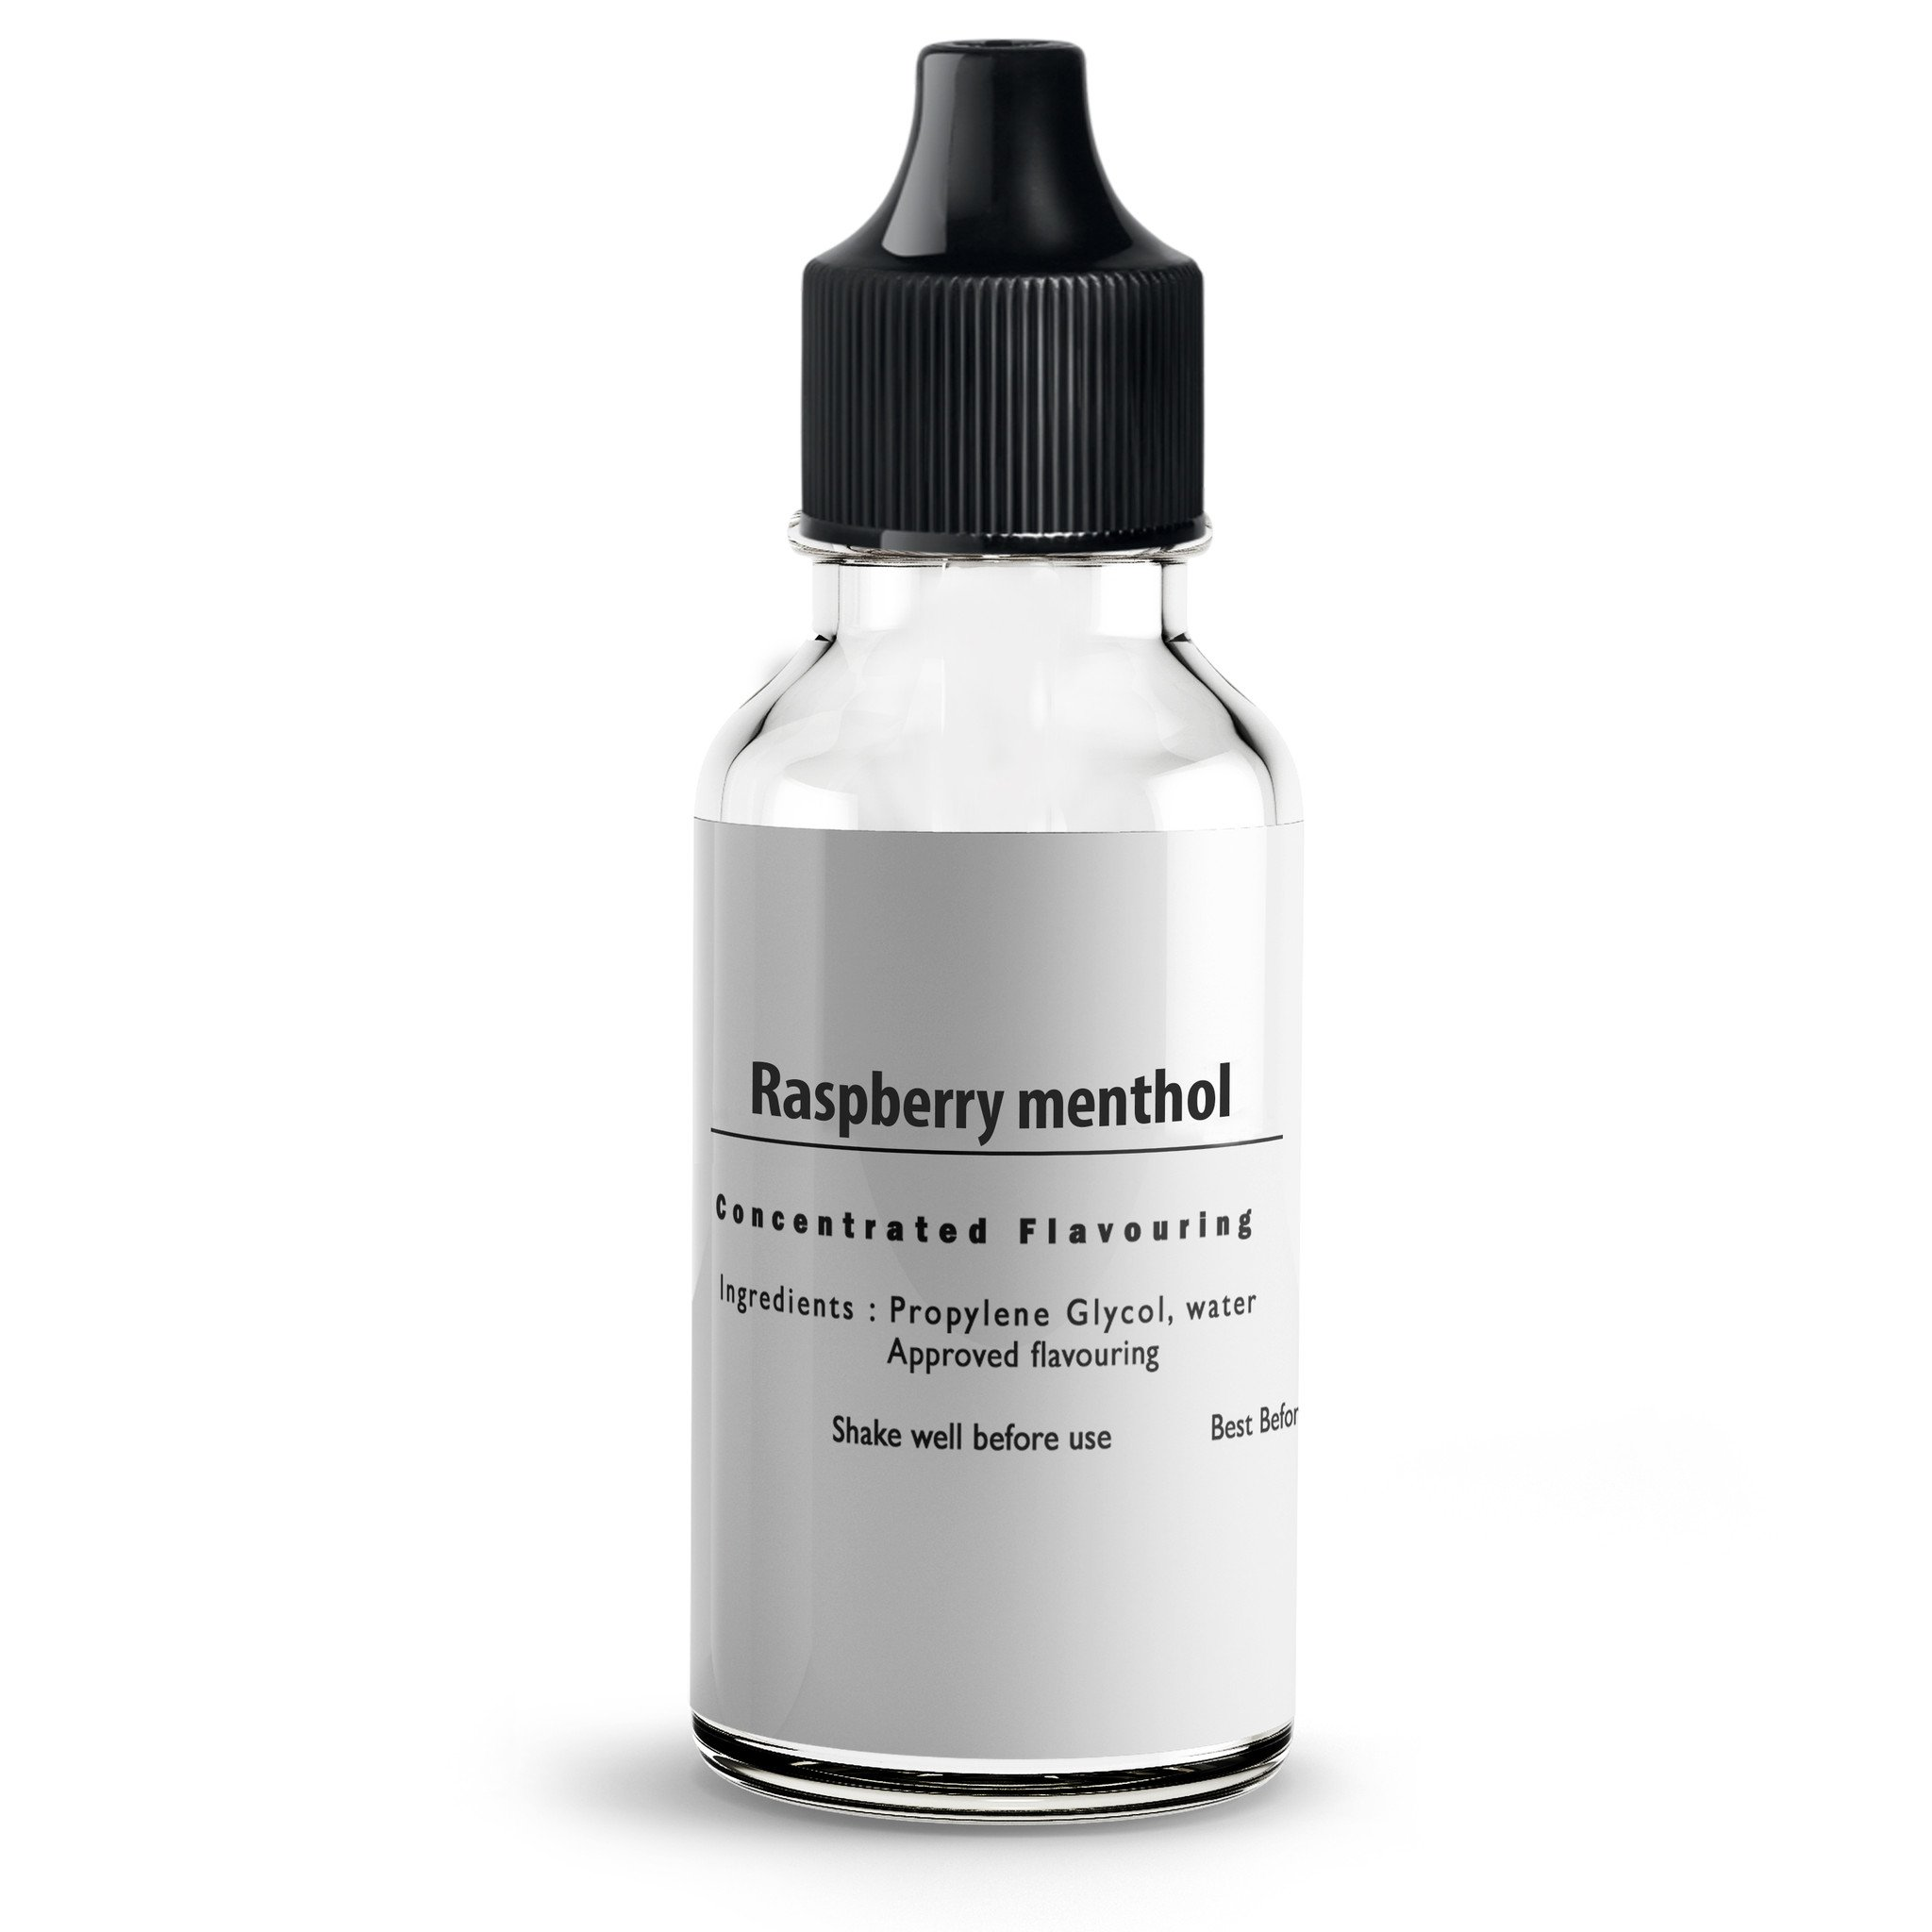 Raspberry Menthol Flavour Concentrate For E Liquids